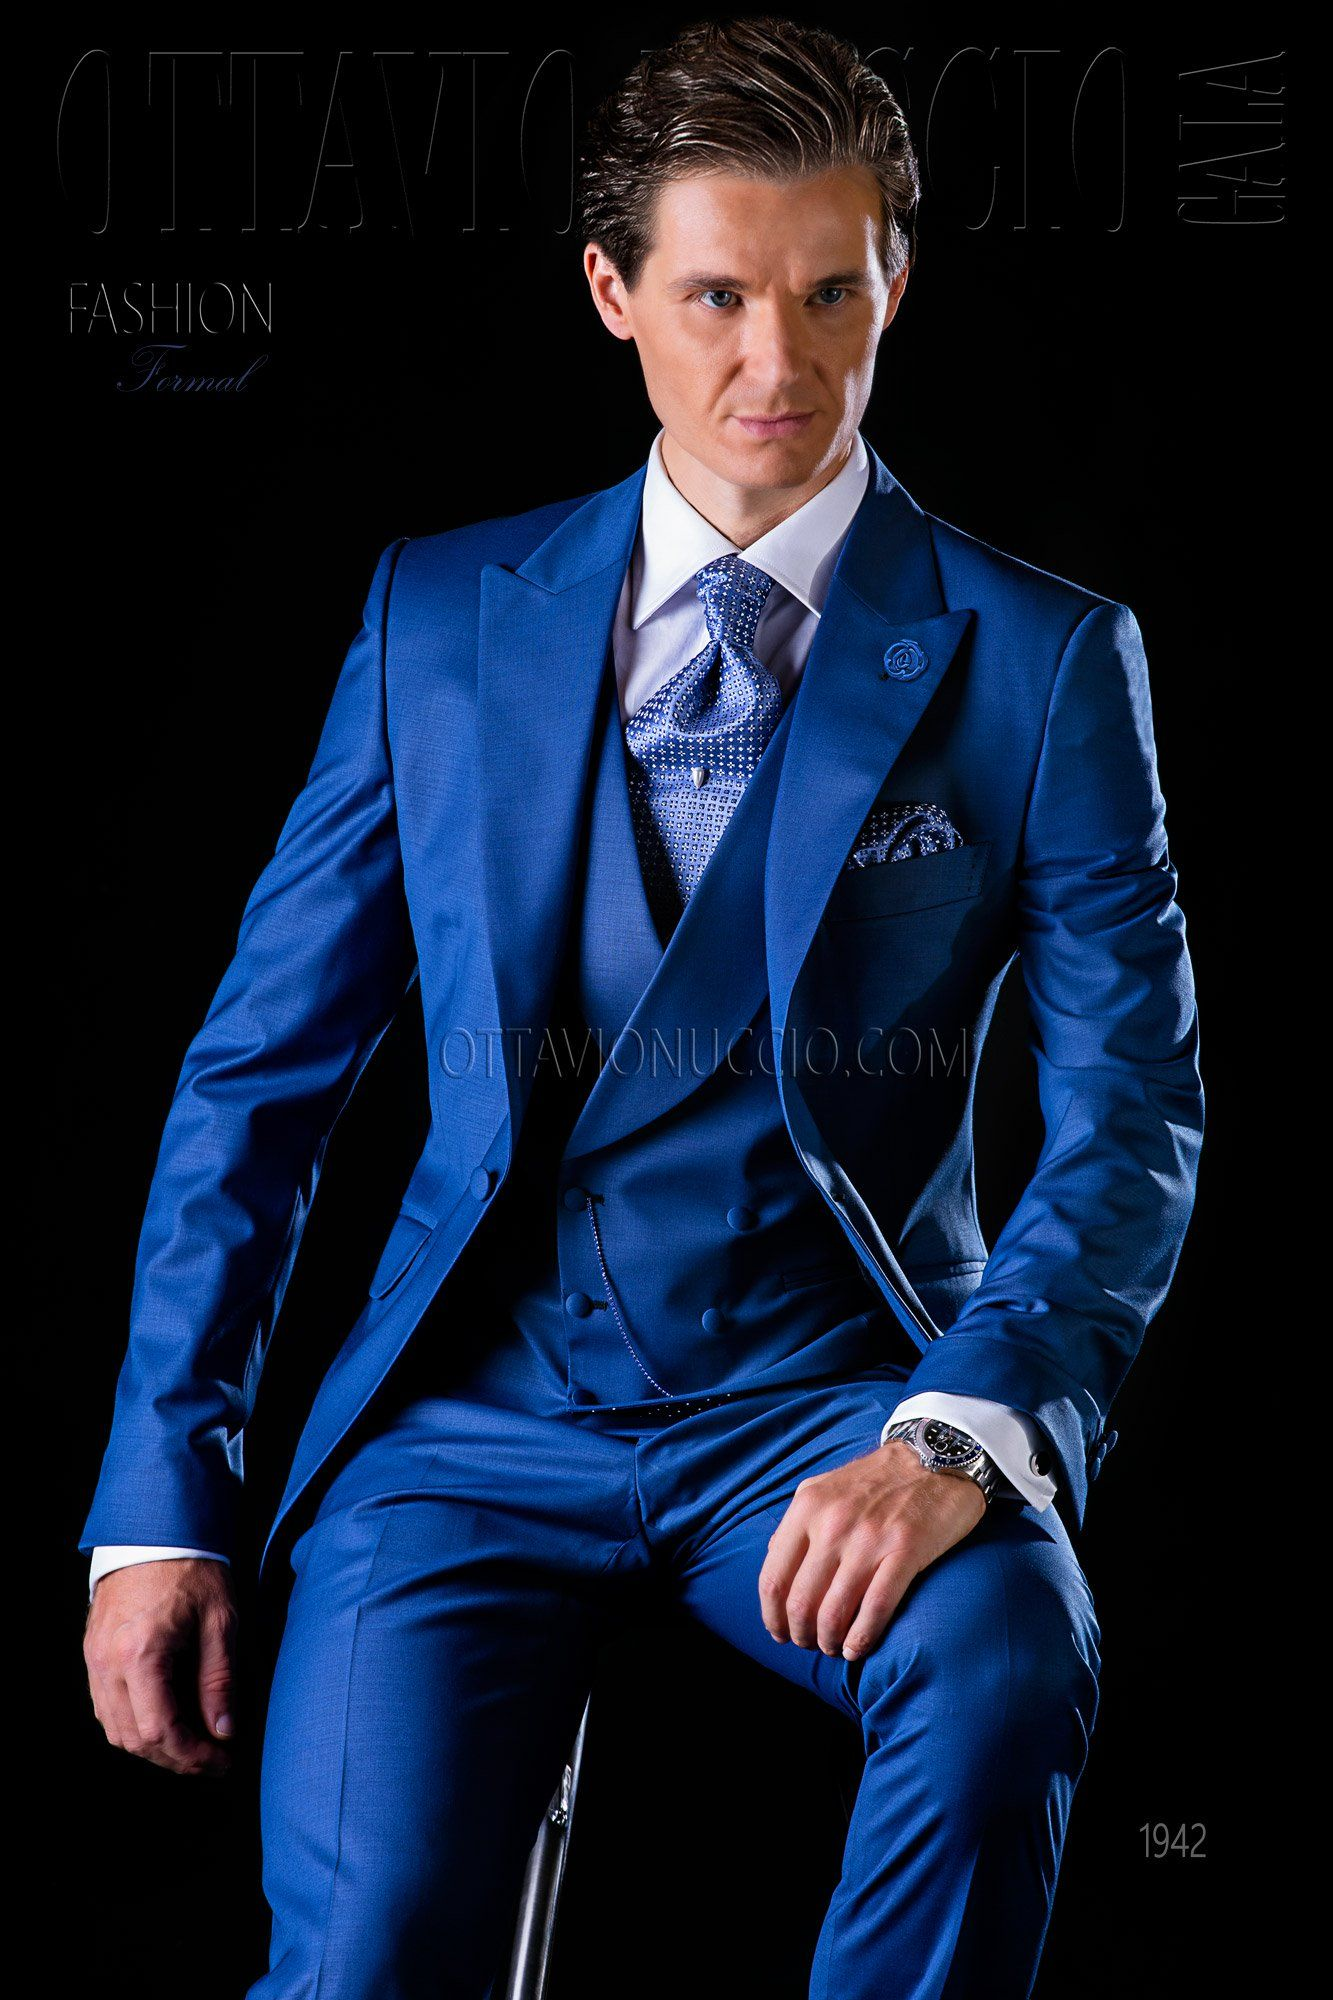 055d18a87ea3 Royal blue three piece groom suit wedding - tuxedo - formalwear - luxury -  menswear - dapper - madeinitaly